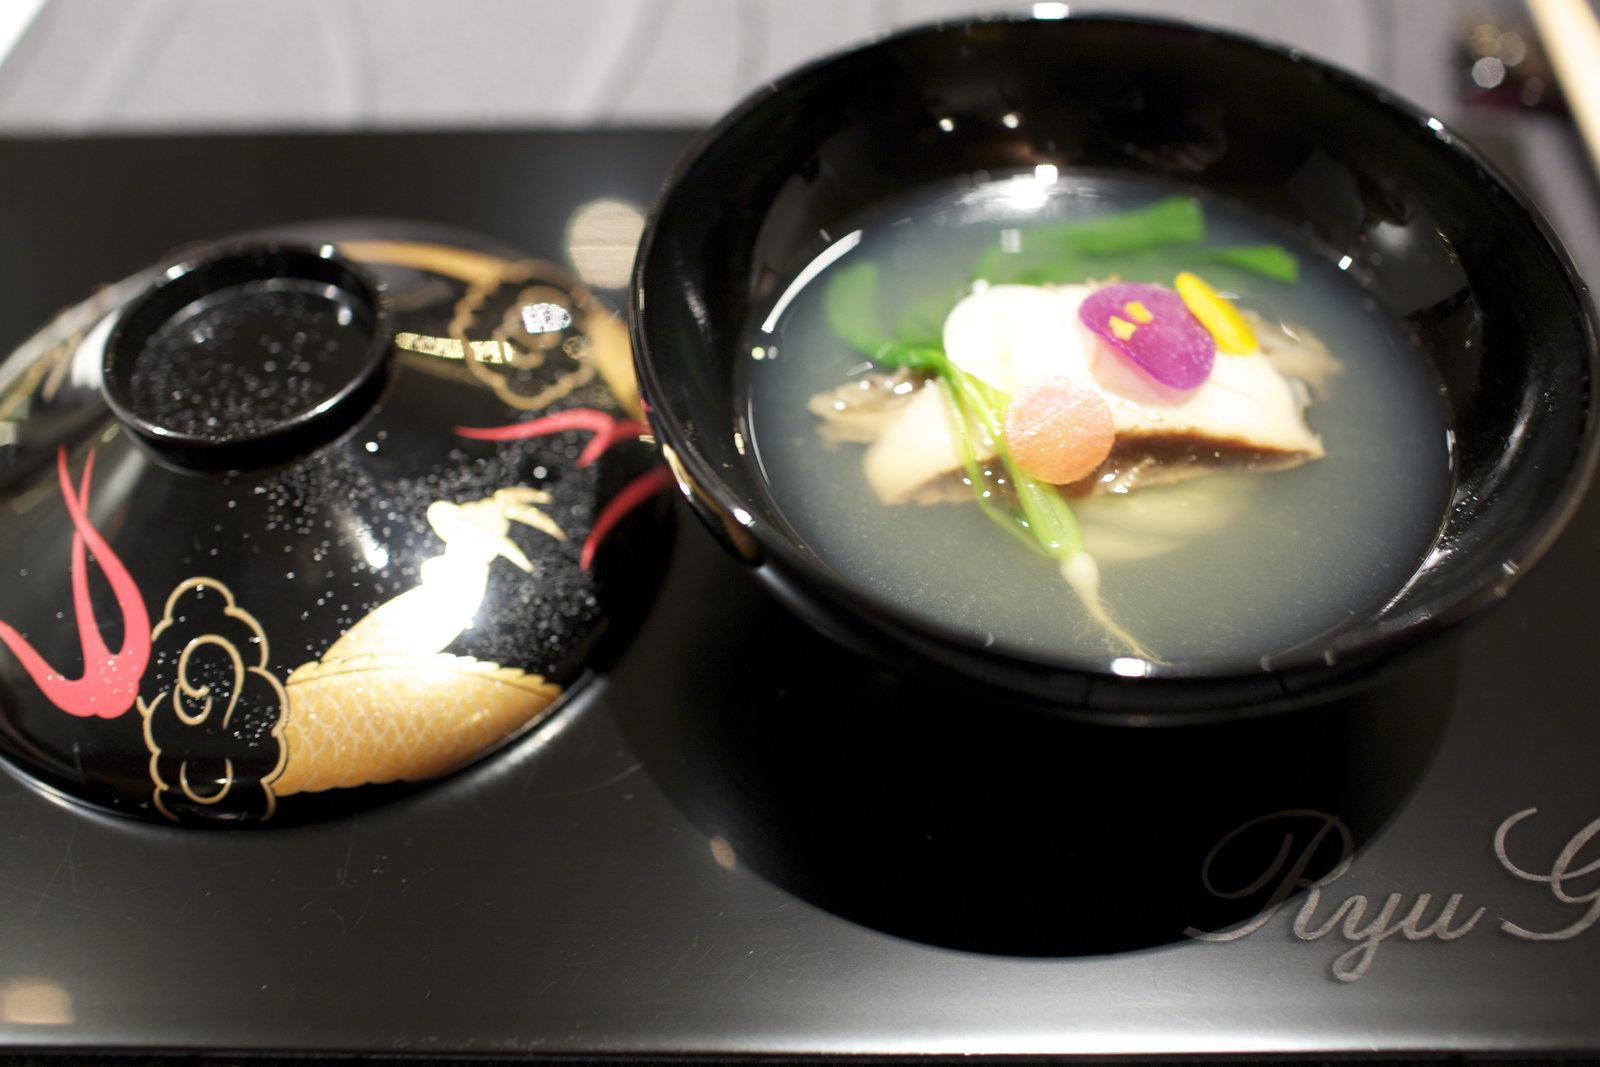 RyuGin - Hot soup of matsuba brand Tanner crab from Port Shibayama in season's greetings style